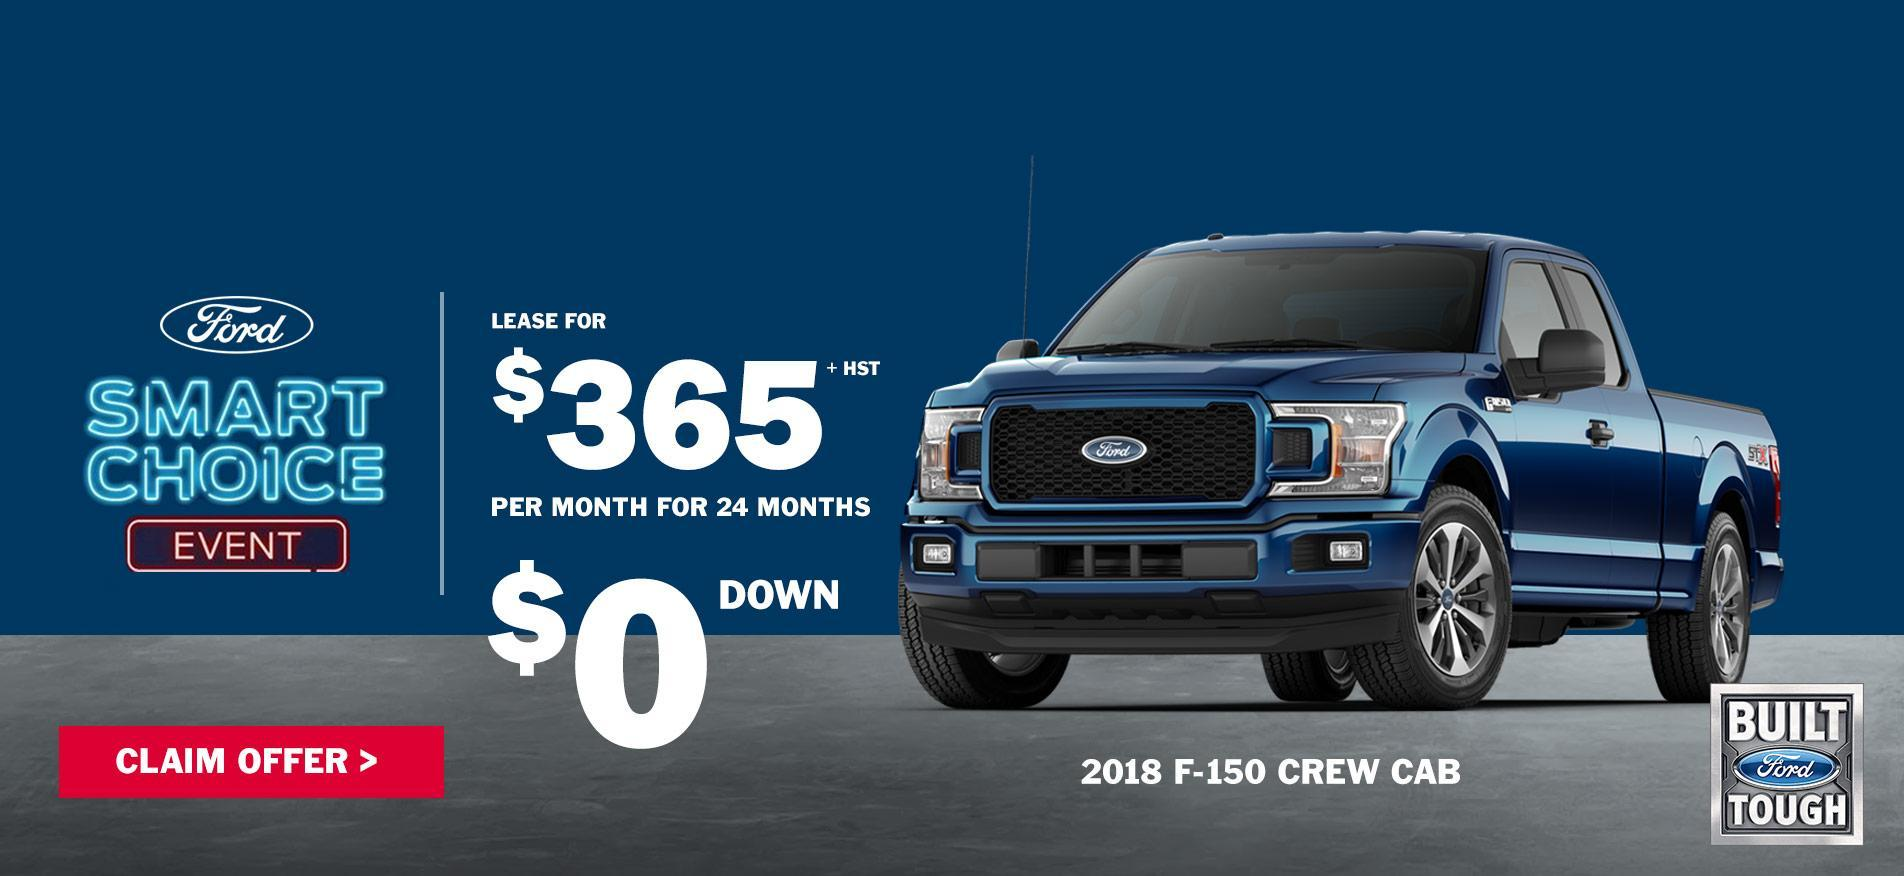 Cavalcade Ford - F-150 Special